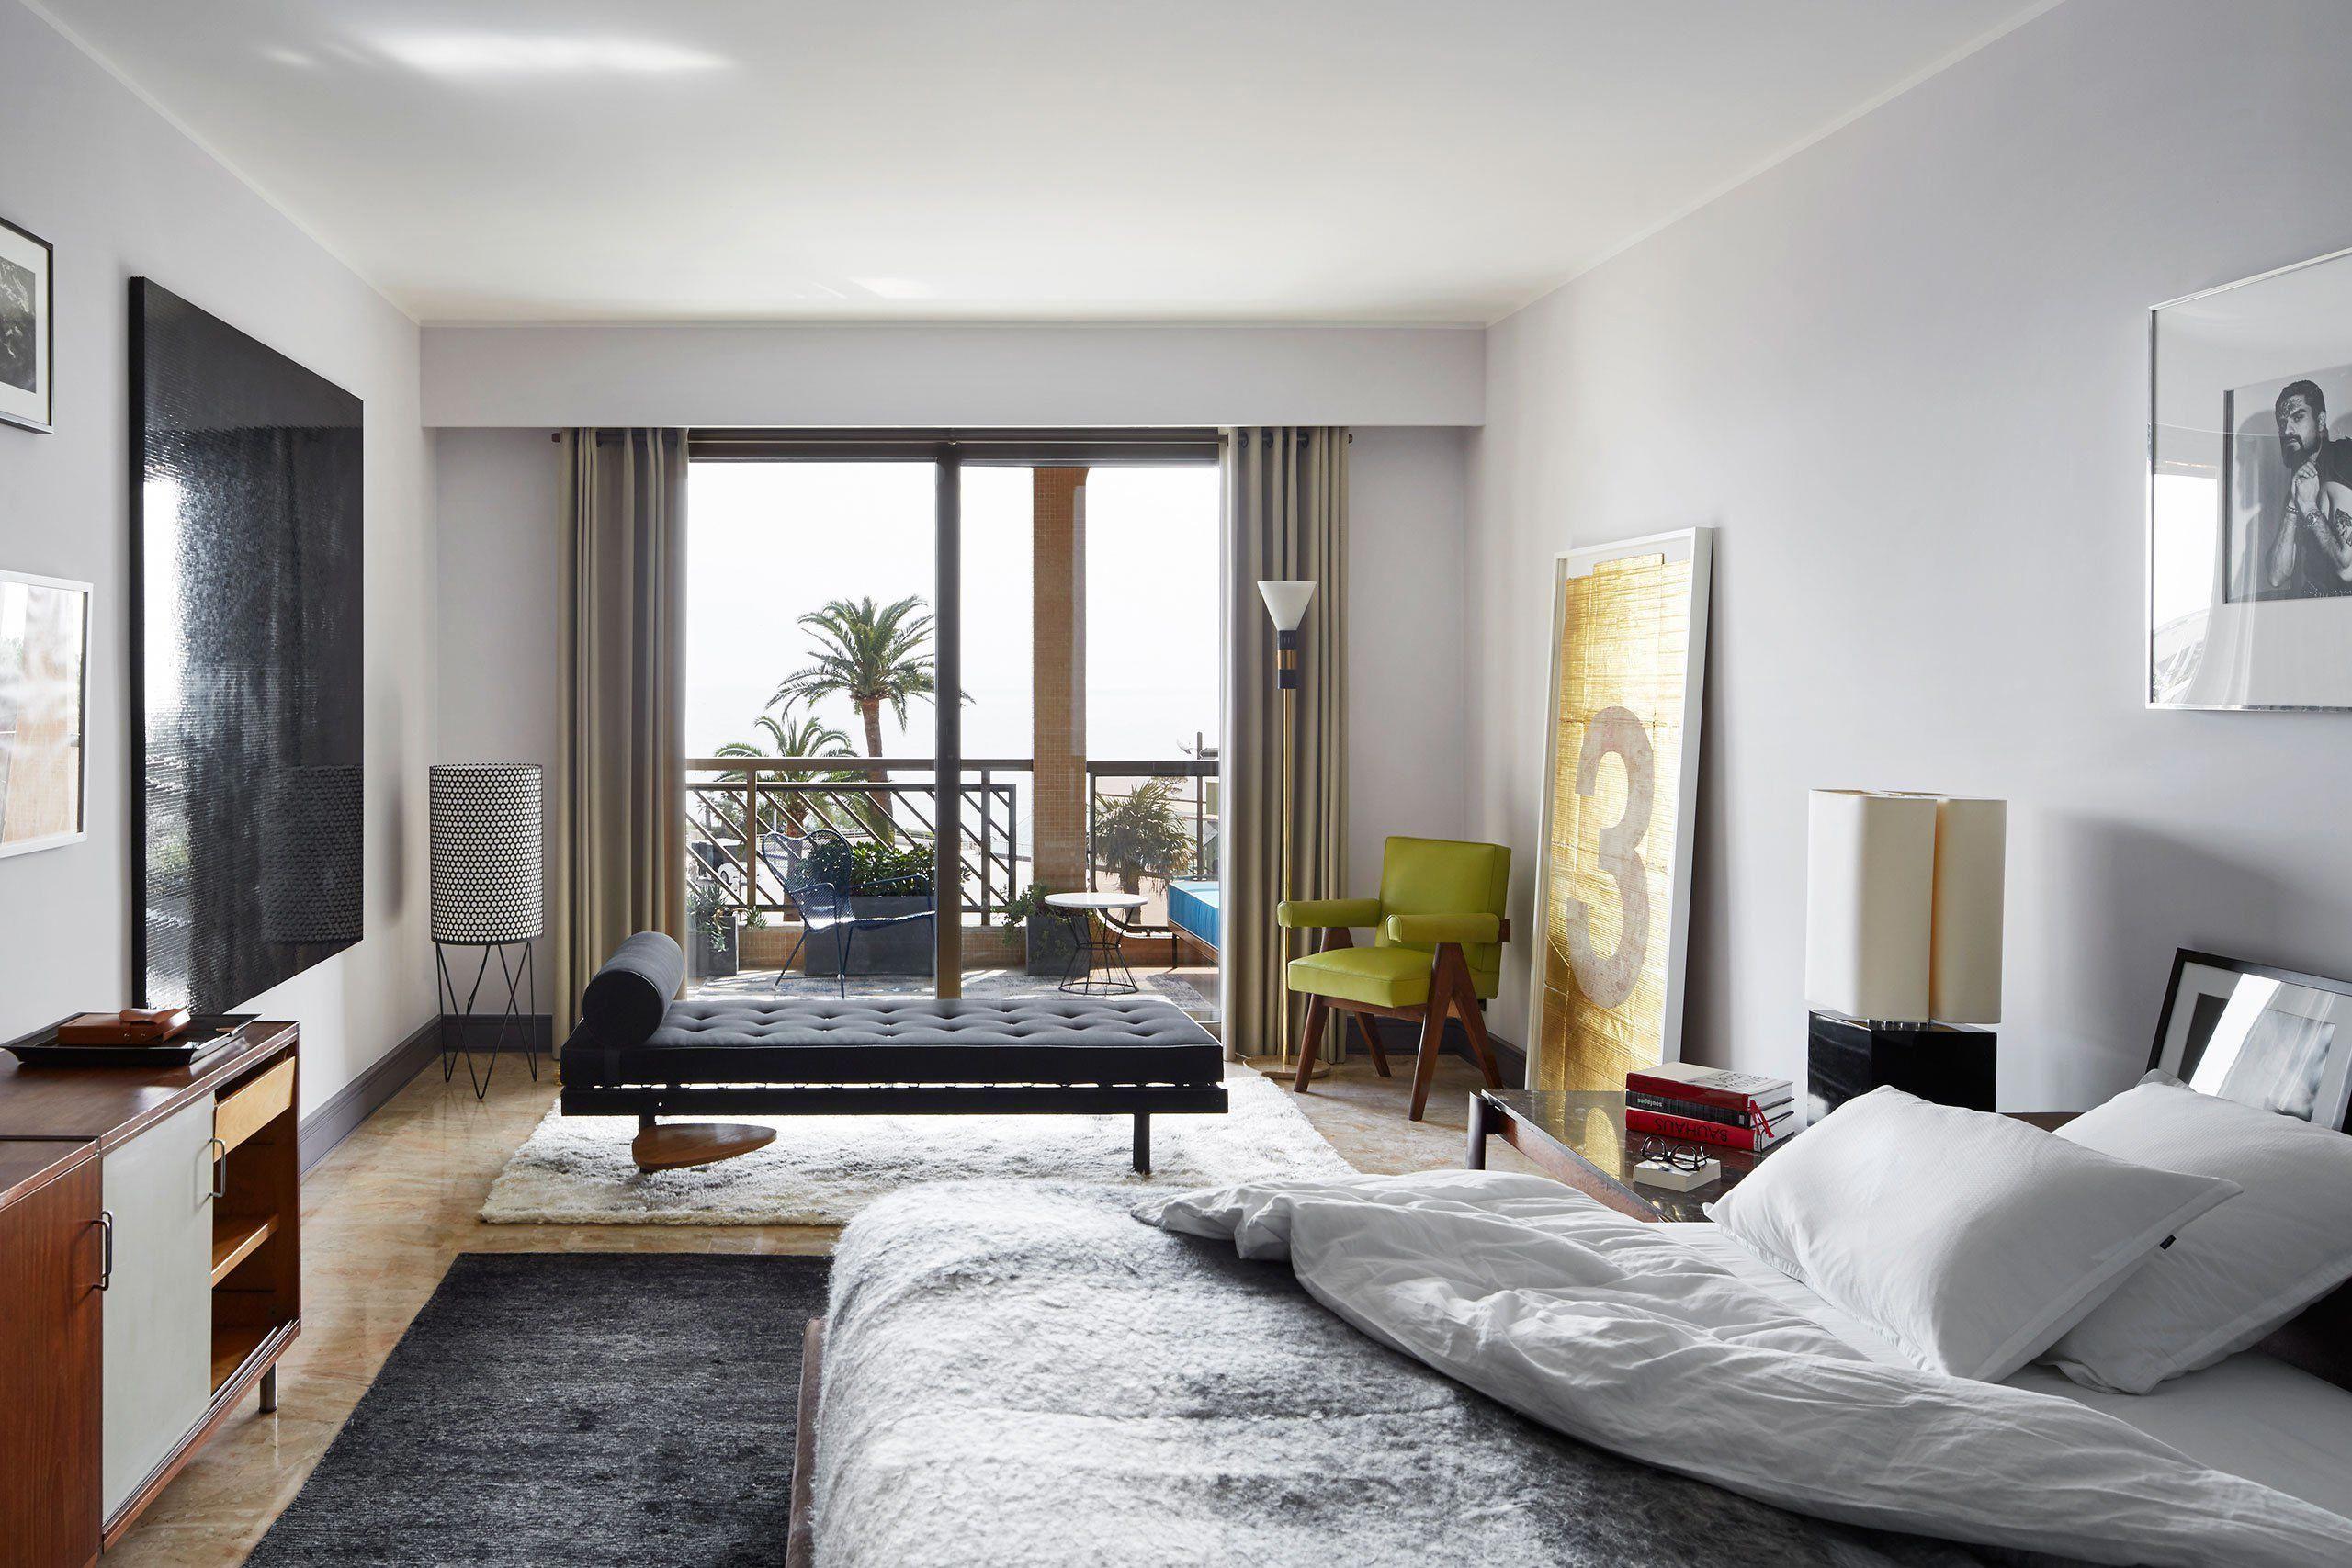 Photo francis amiand sweet home make interior decoration decor design sculpture styles also rh pinterest